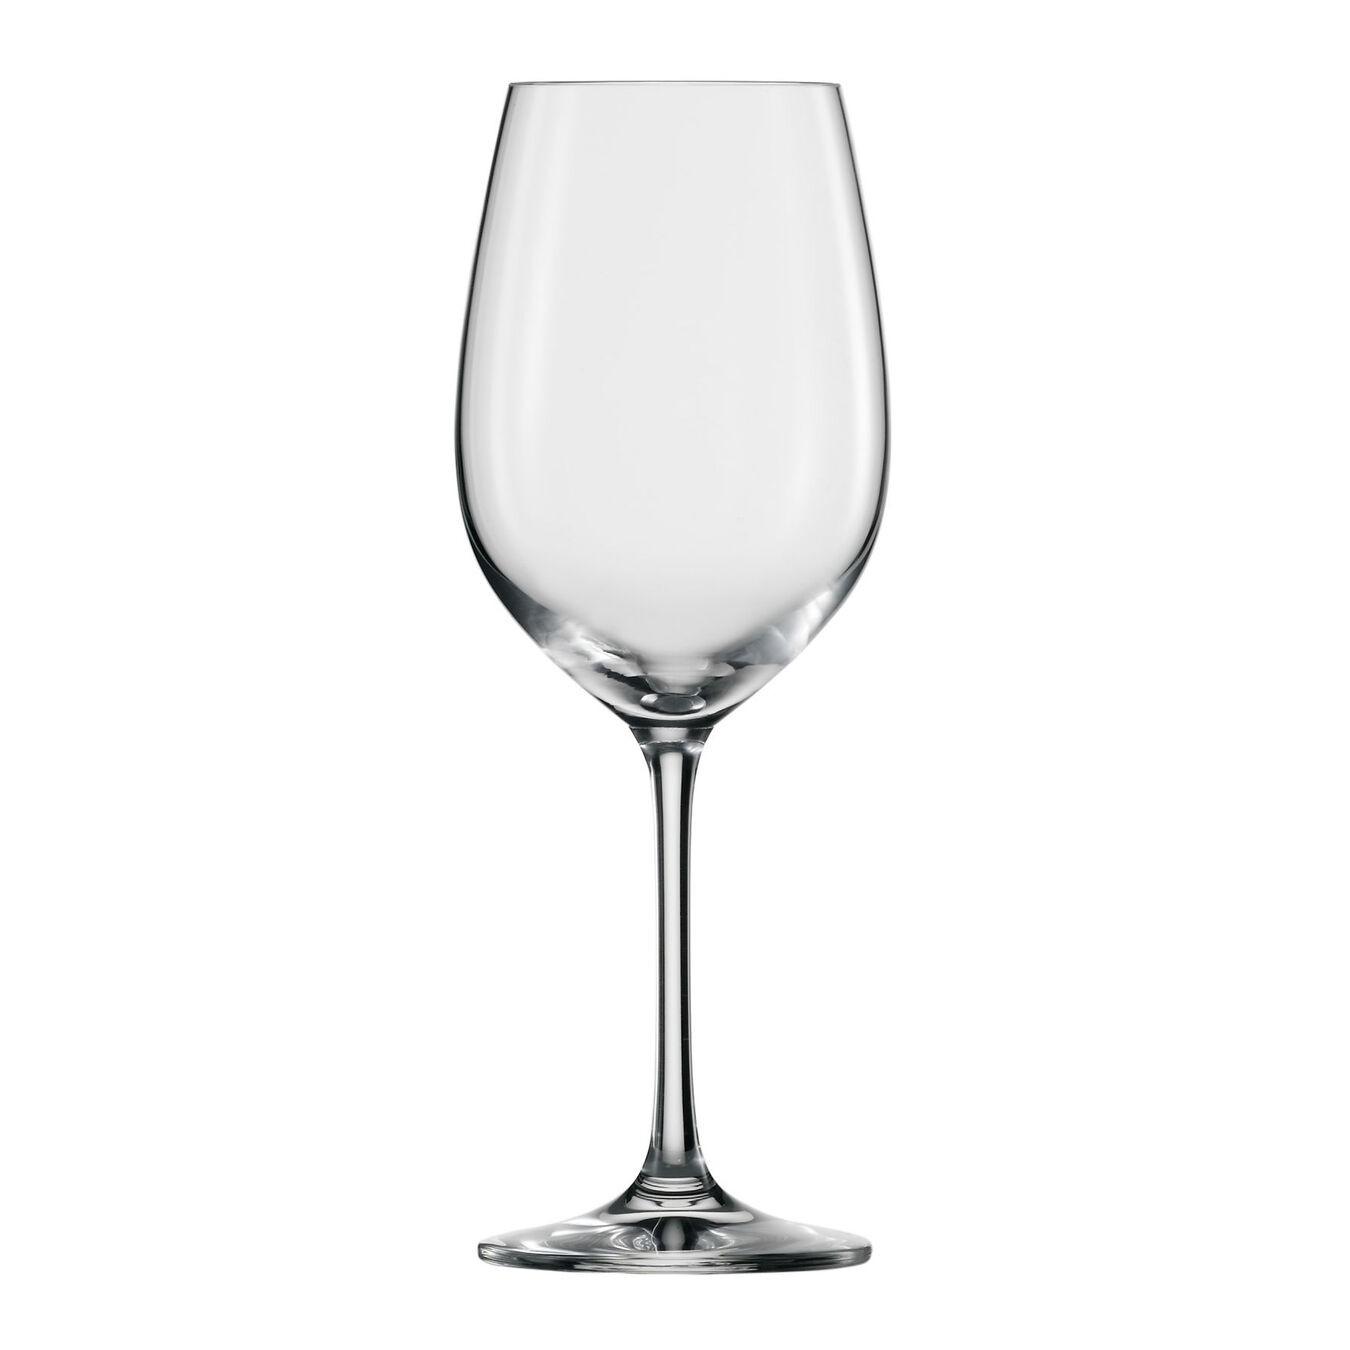 Conjunto Com 6 Taças Para Vinho Branco 349 Ml  - Schott-Zwiesel Ivento